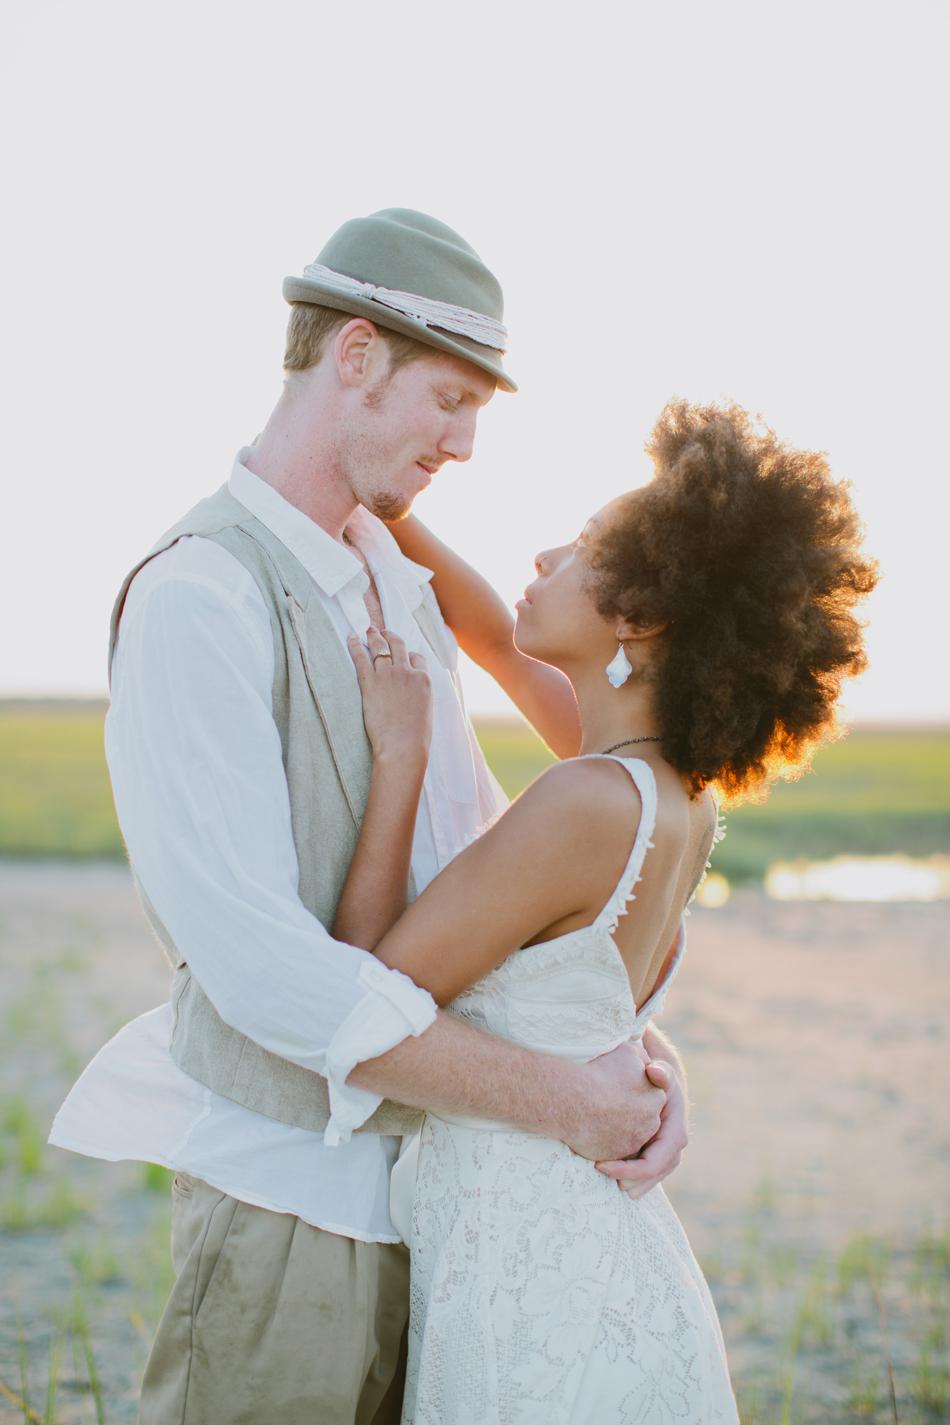 Jameykay_arlie_bohemian_elopement_styled_shoot073.jpg